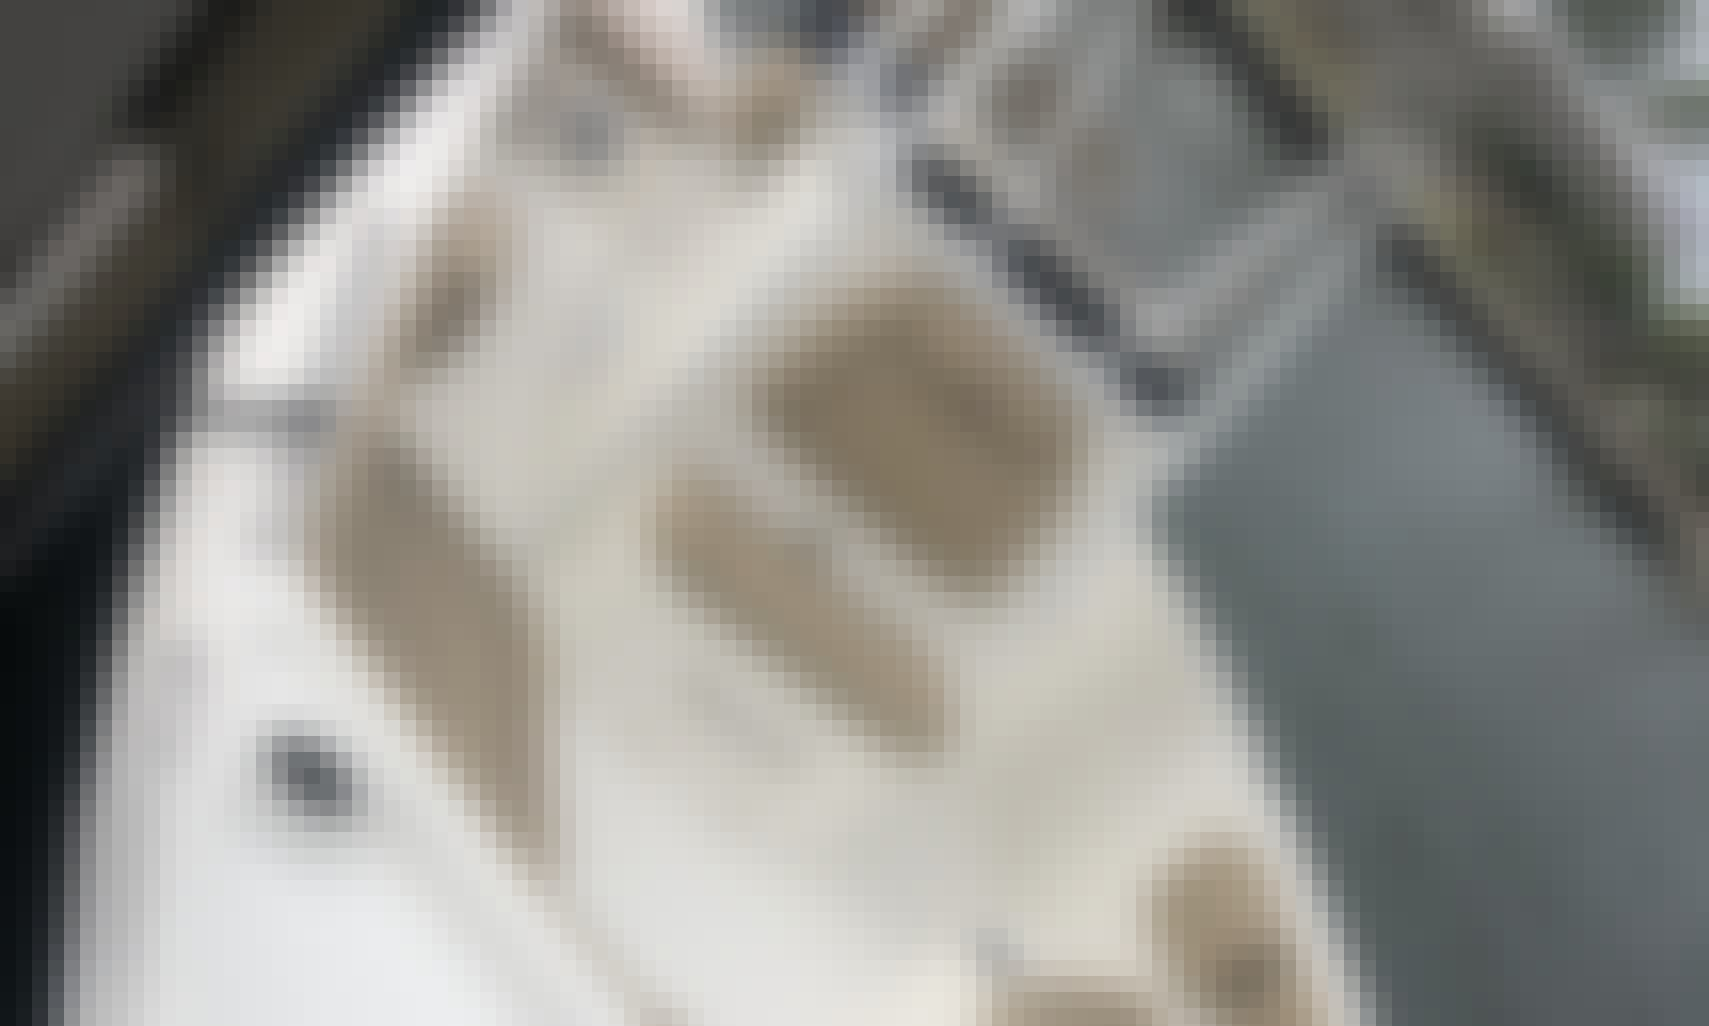 Nauticstar 231 Hybrid Center Console Boat Rental in Bradenton or Sarasota